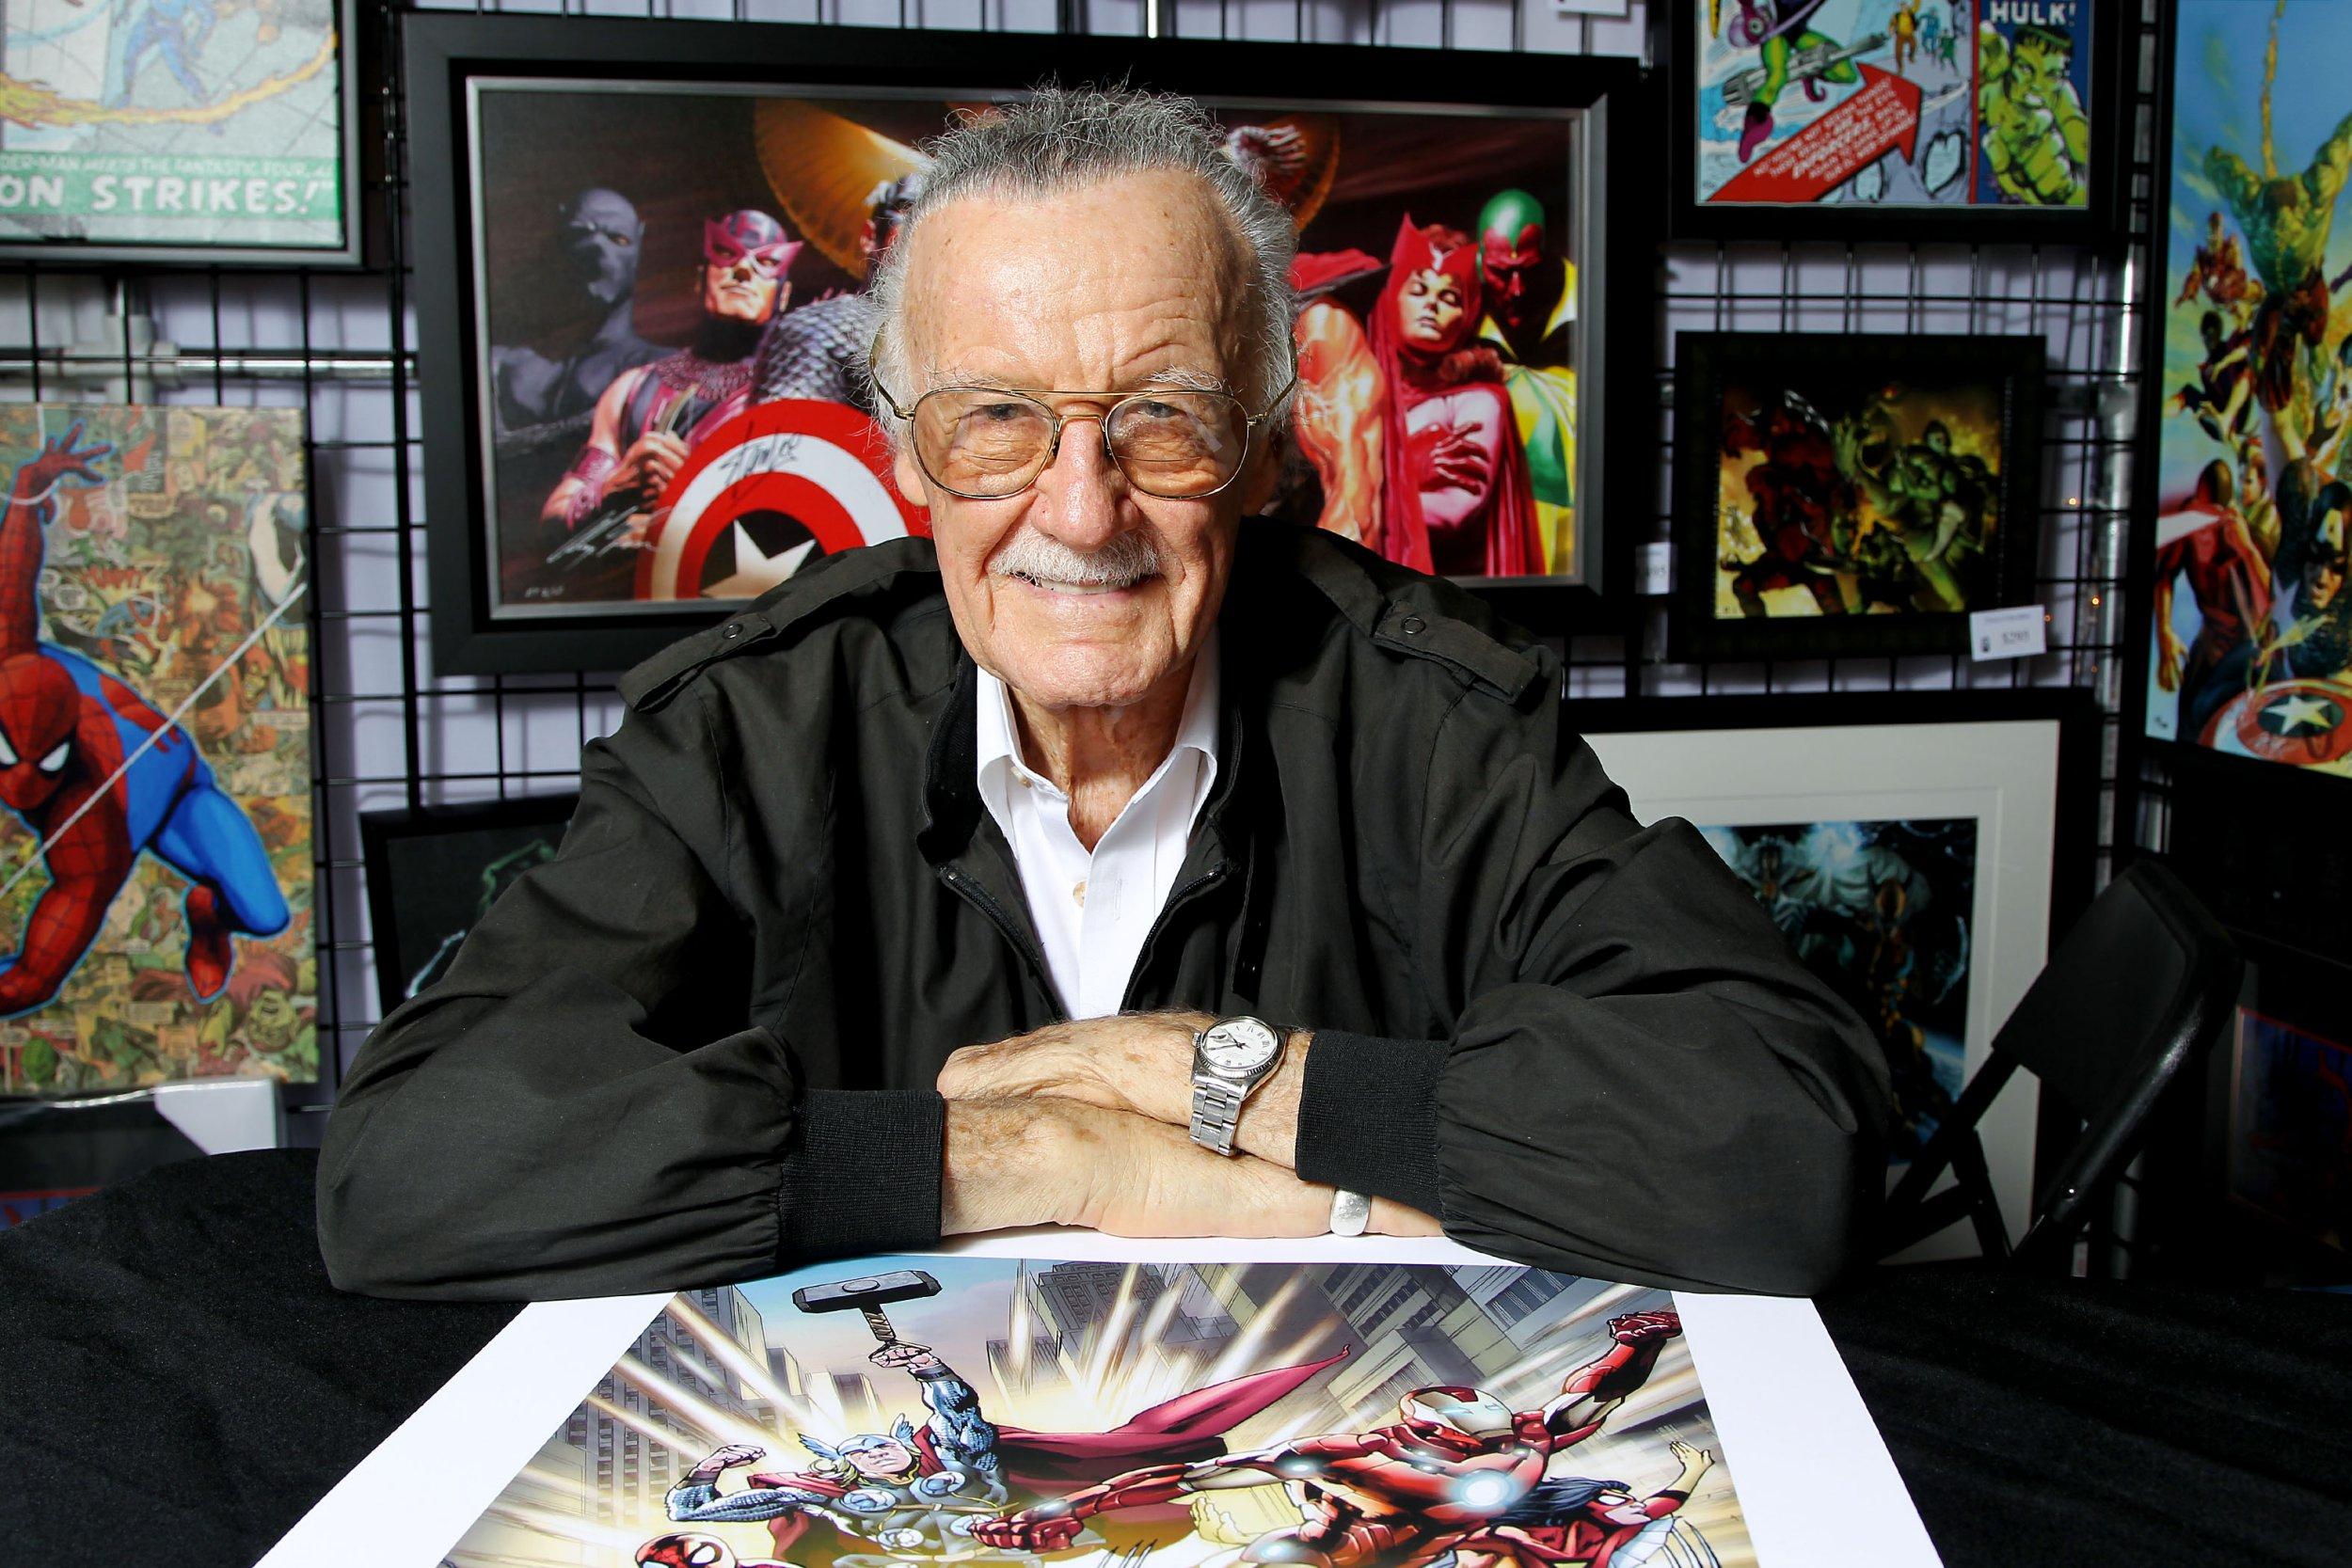 Mandatory Credit: Photo by Marion Curtis/StarPix/REX/Shutterstock (5628342c) Stan Lee Marvel Fine Art Program launch at New York Comic Con, America - 12 Oct 2012